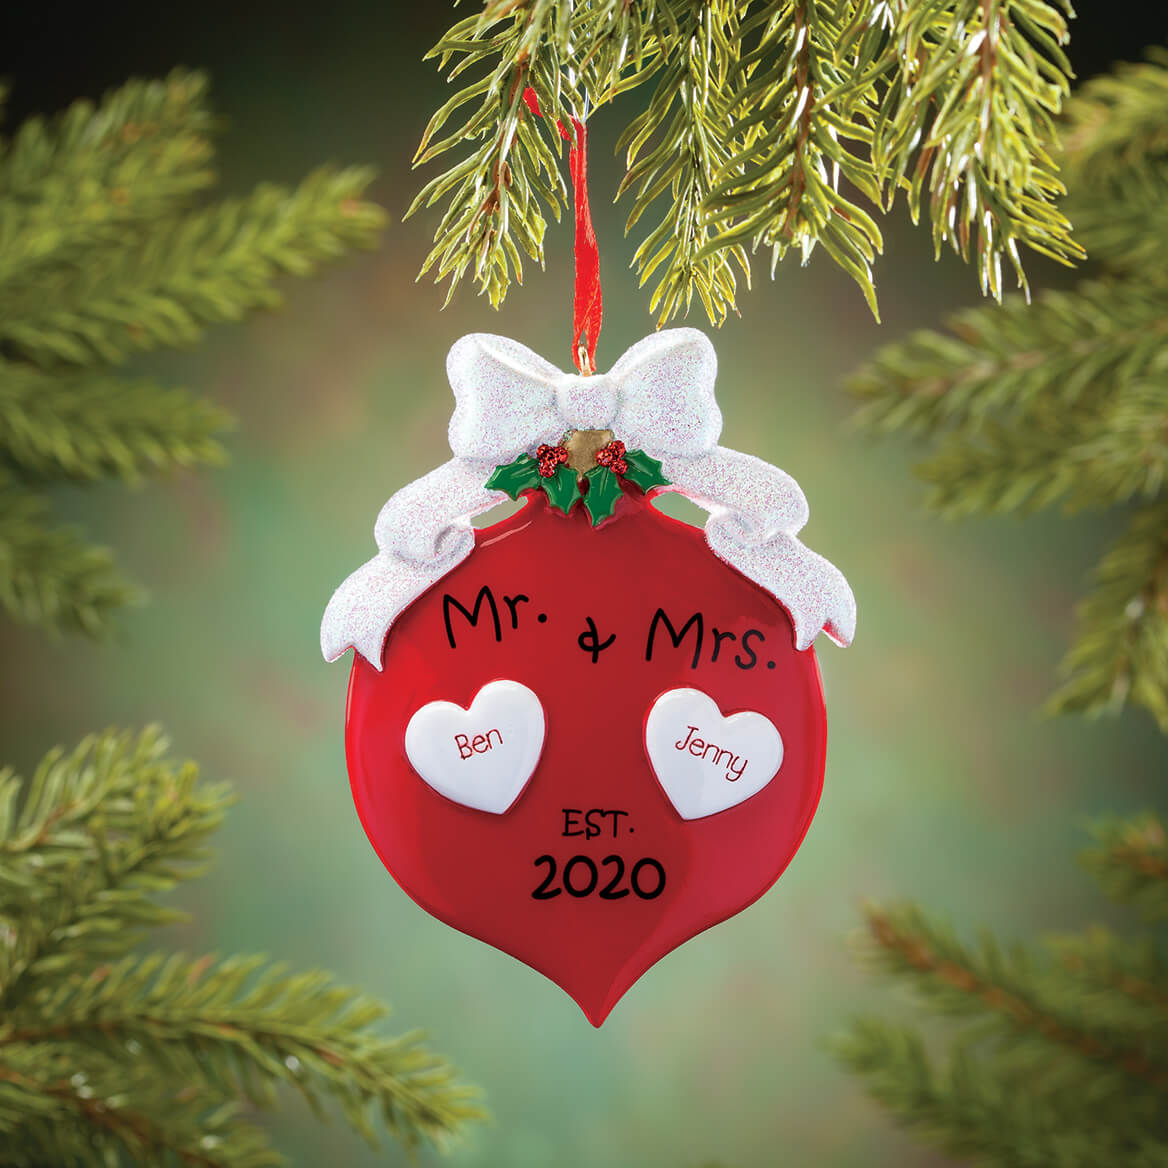 Personalized Mr. & Mrs. 2020 Ornament-370770